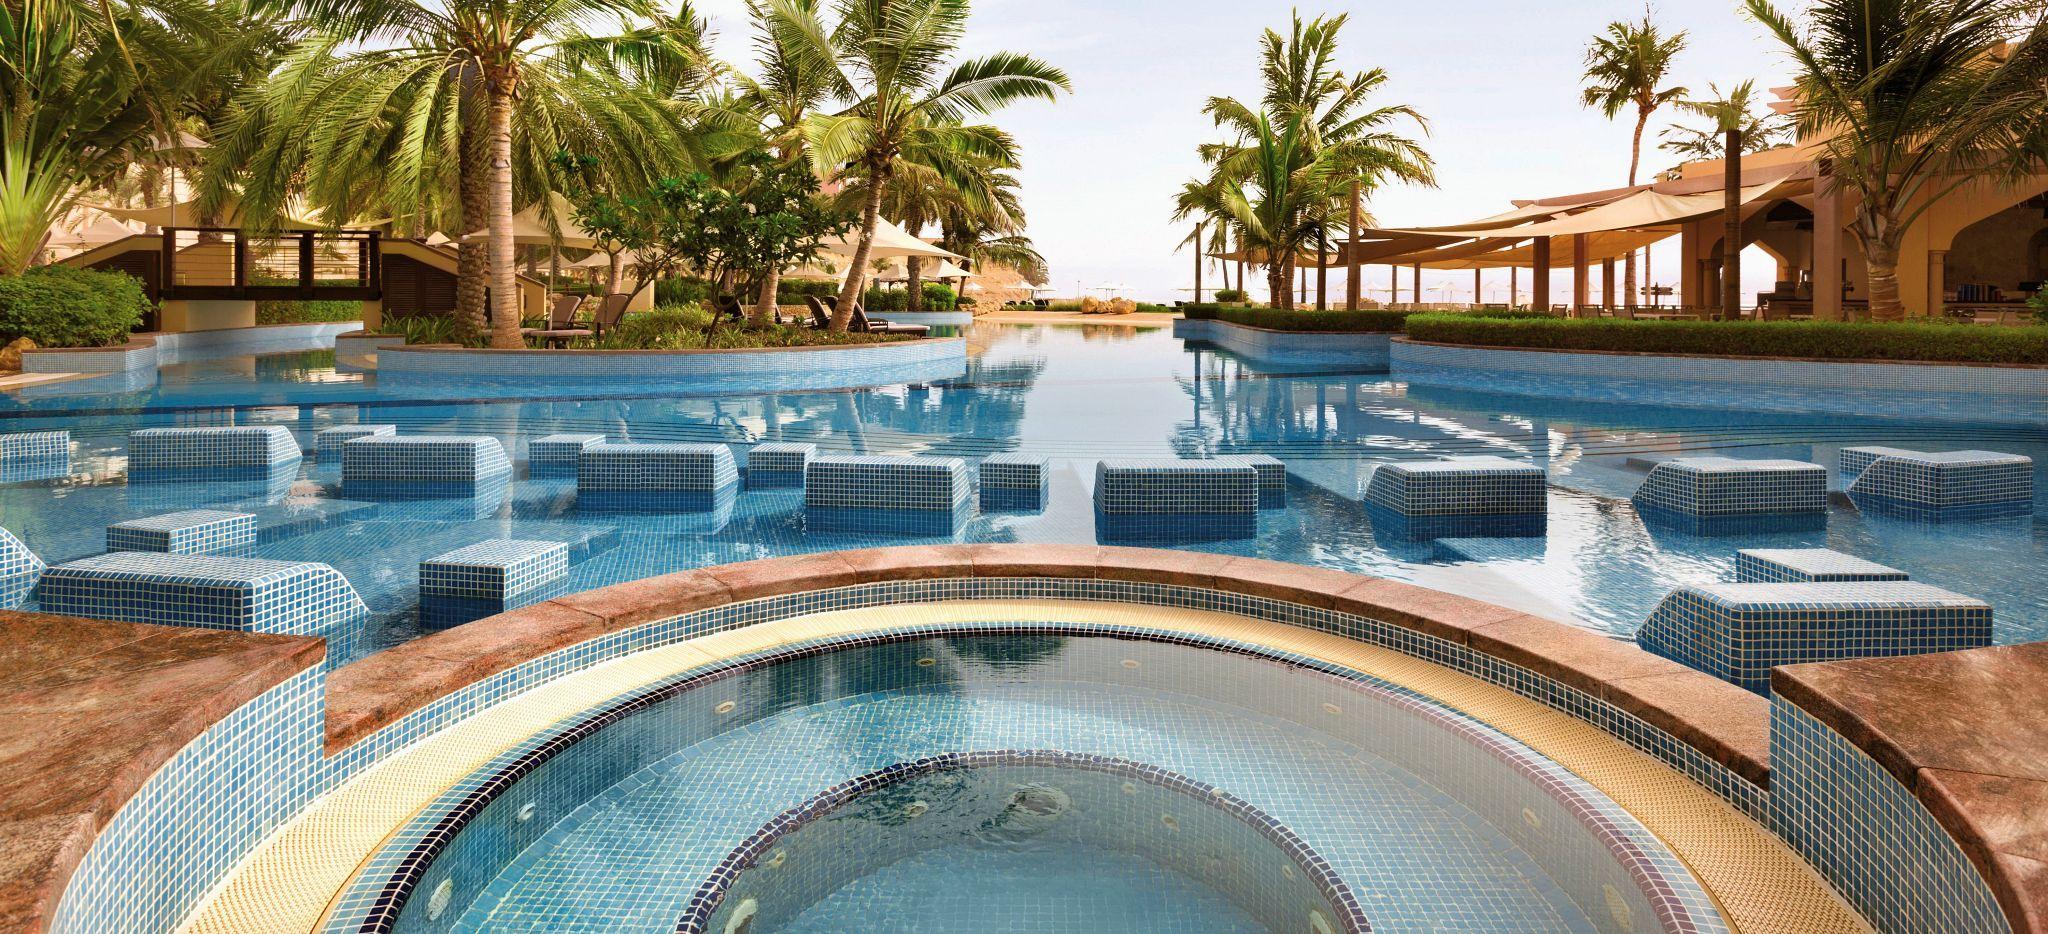 Outdoor Jacuzzi / Whirlpool und Pool umsäumt mit Palmen im Shangri-La Barr Al Jissah Al Bandar Resort nahe Maskat, Oman